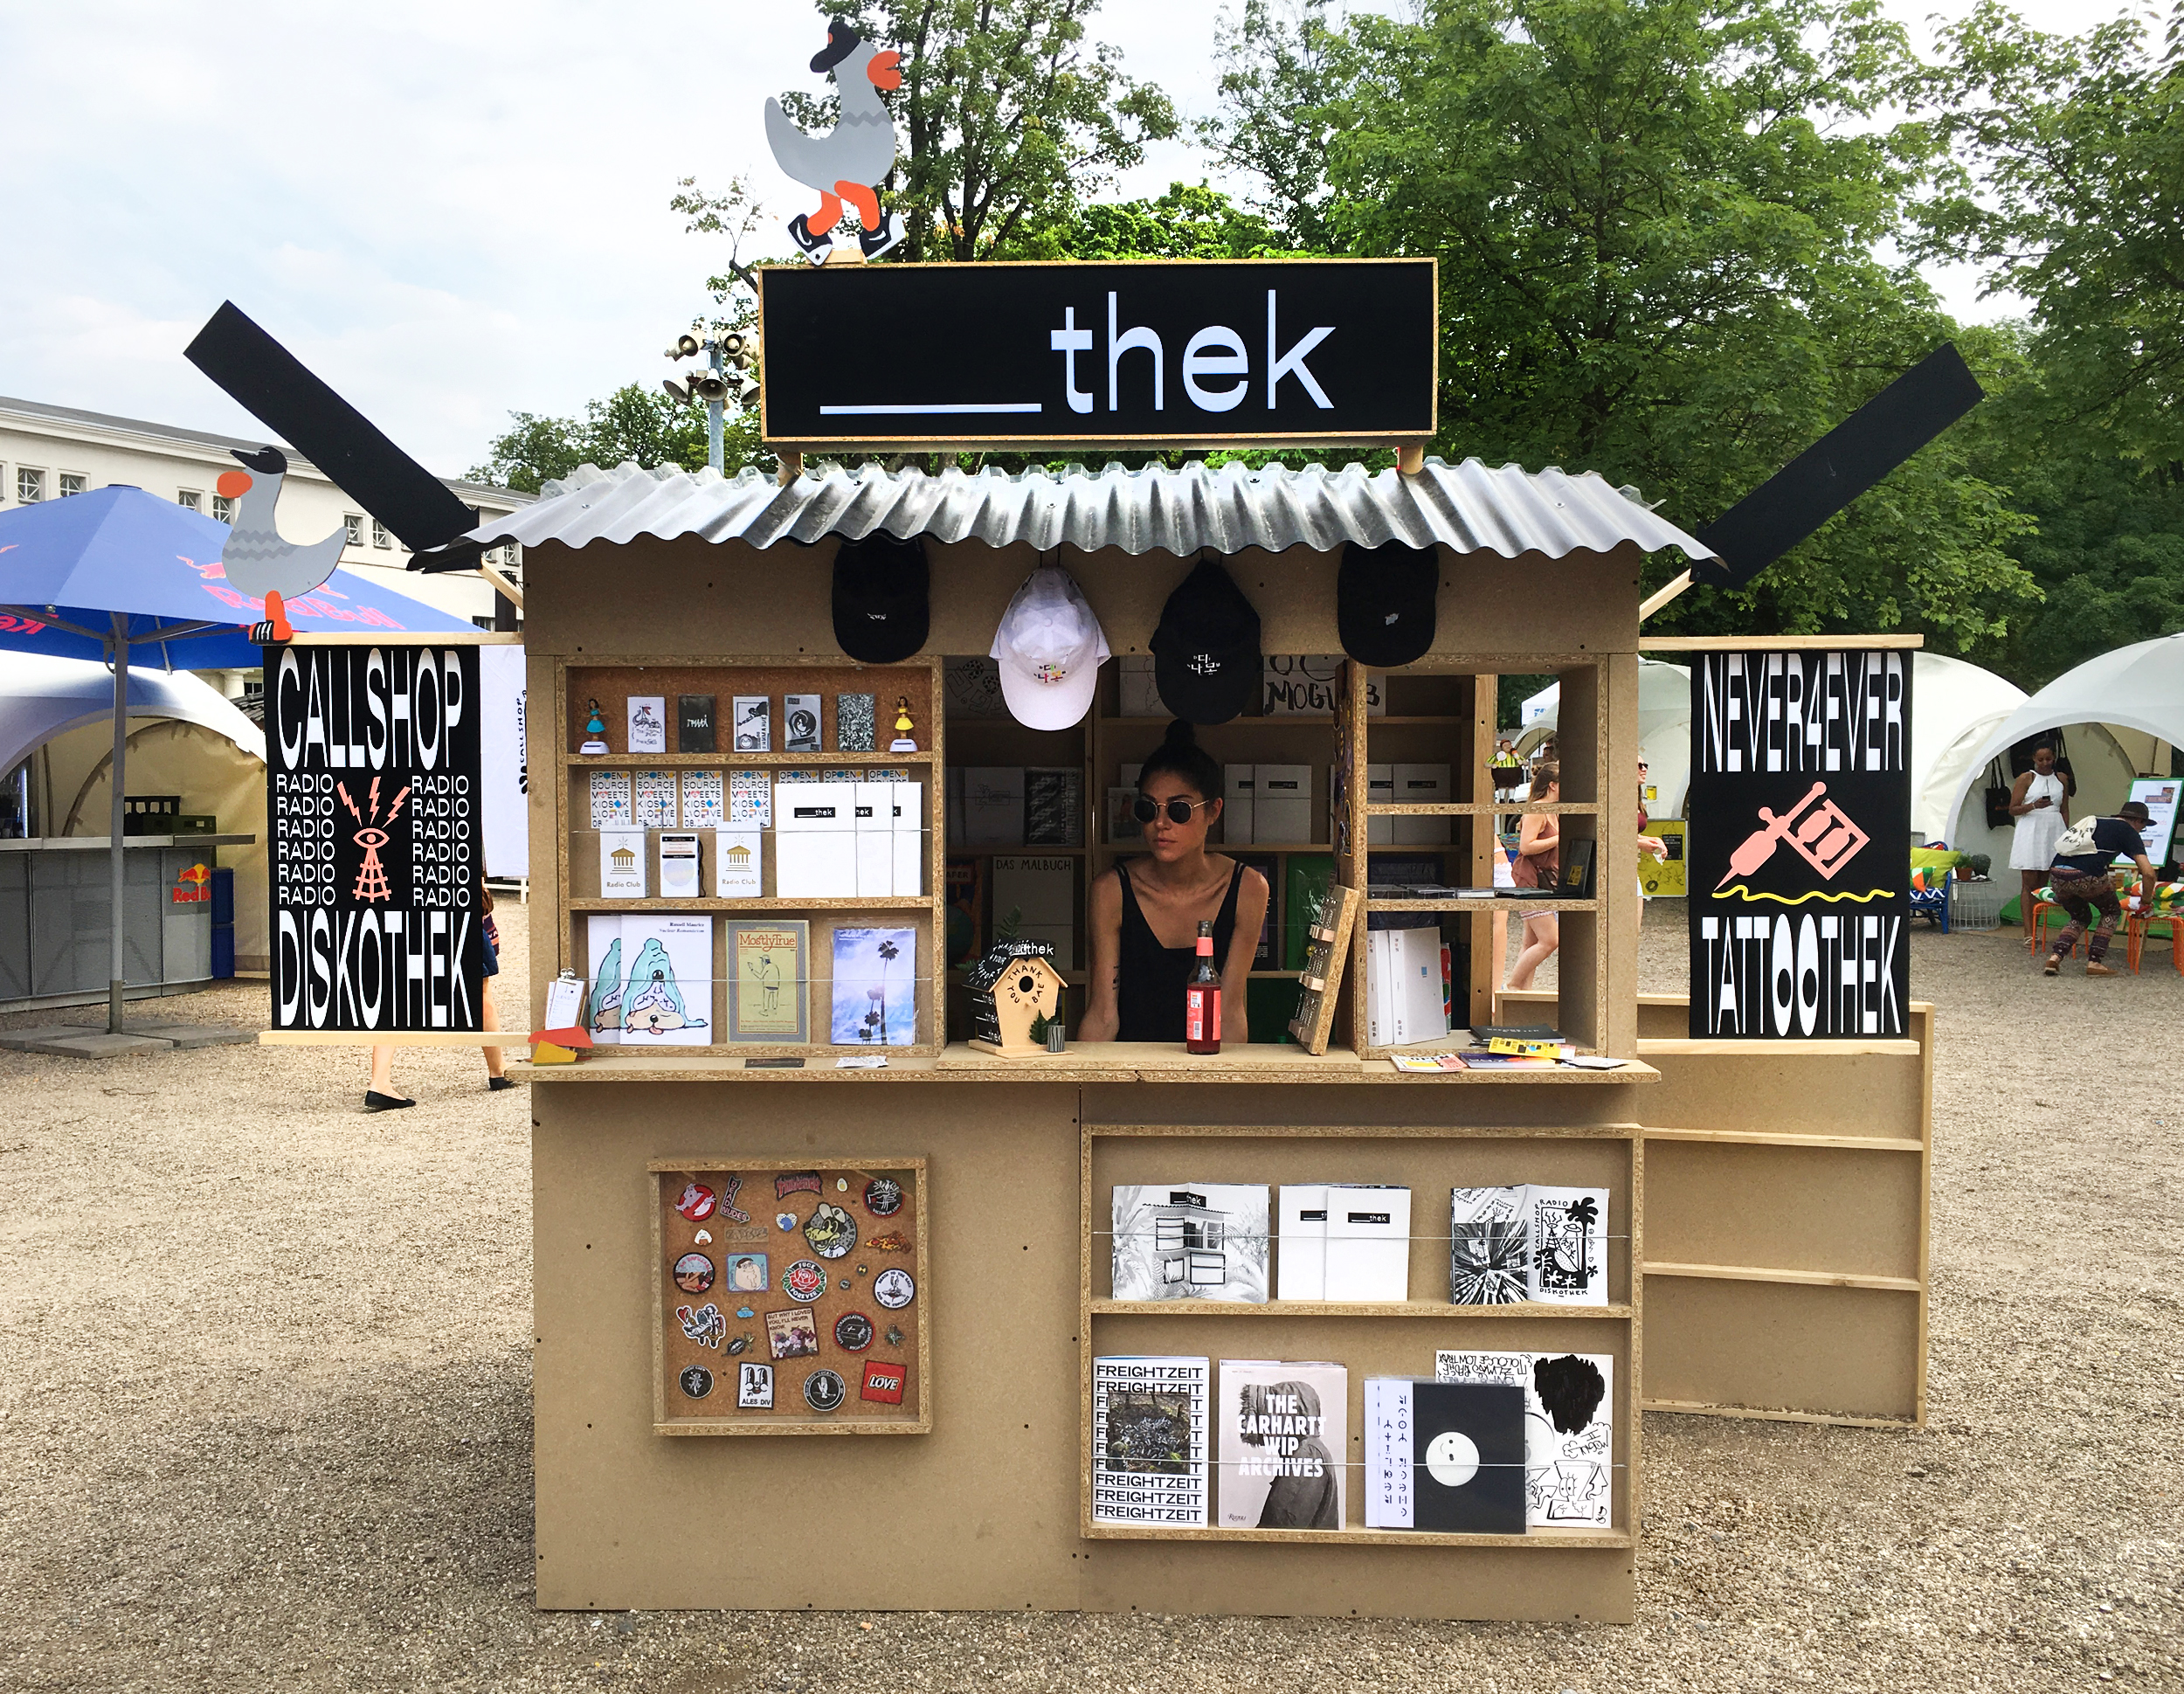 thek_kiosk